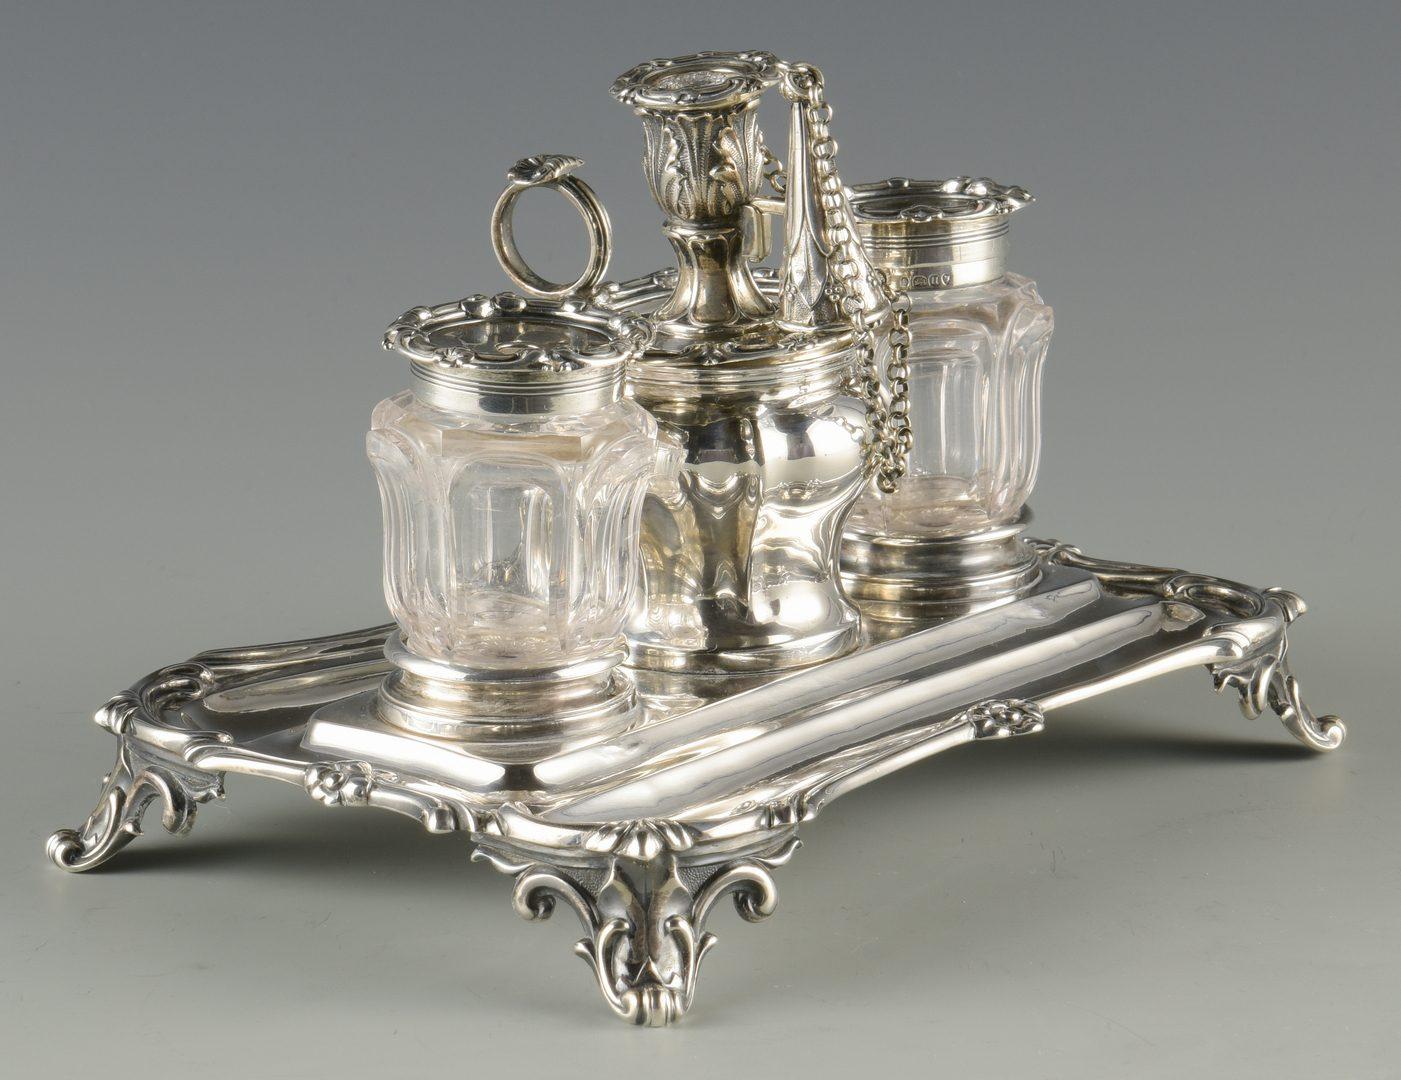 Lot 59: English Sterling Standish, 1835